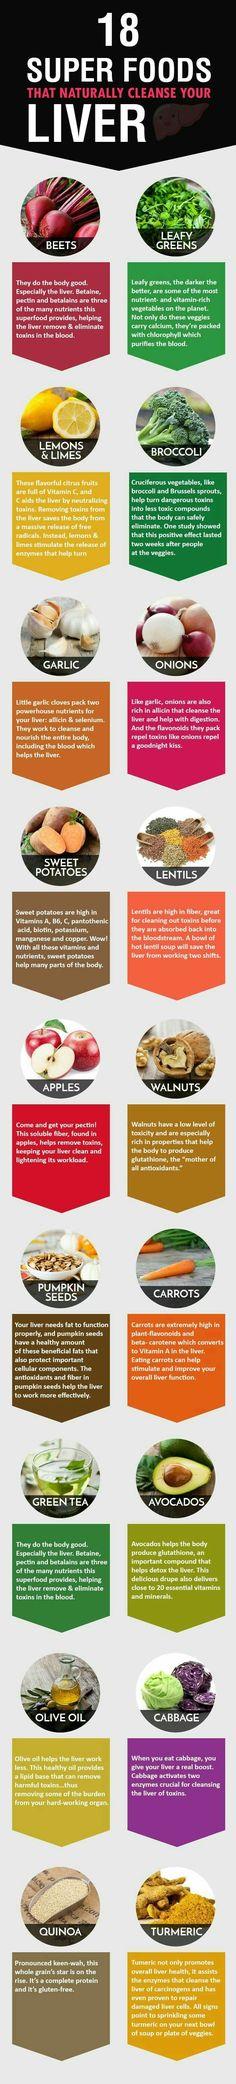 foods for liver